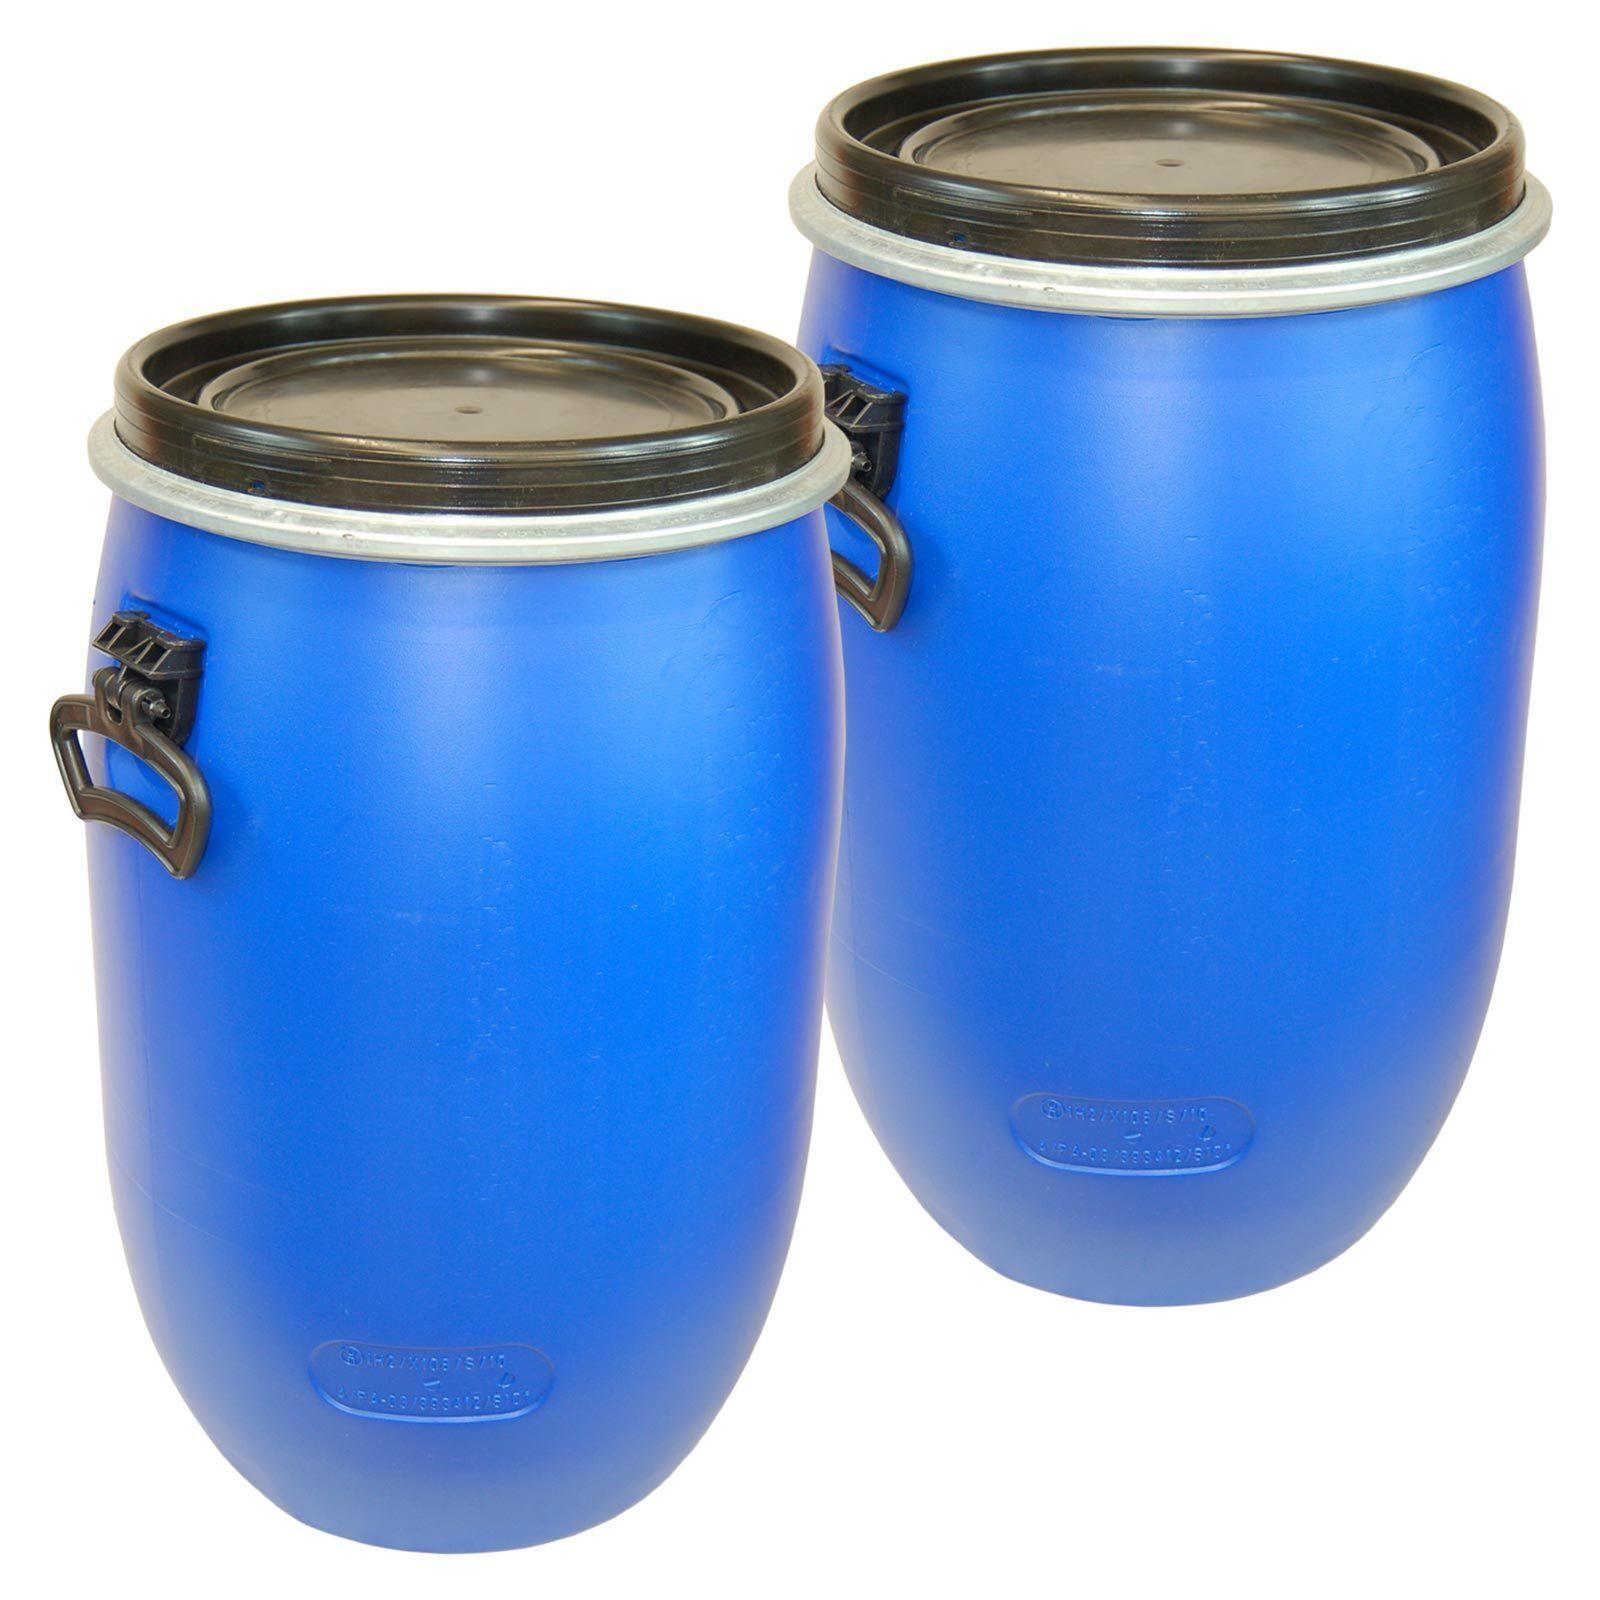 2 x 60 Liter Liter Liter Fass Wasserfass Regenfass Regentonne d416ec